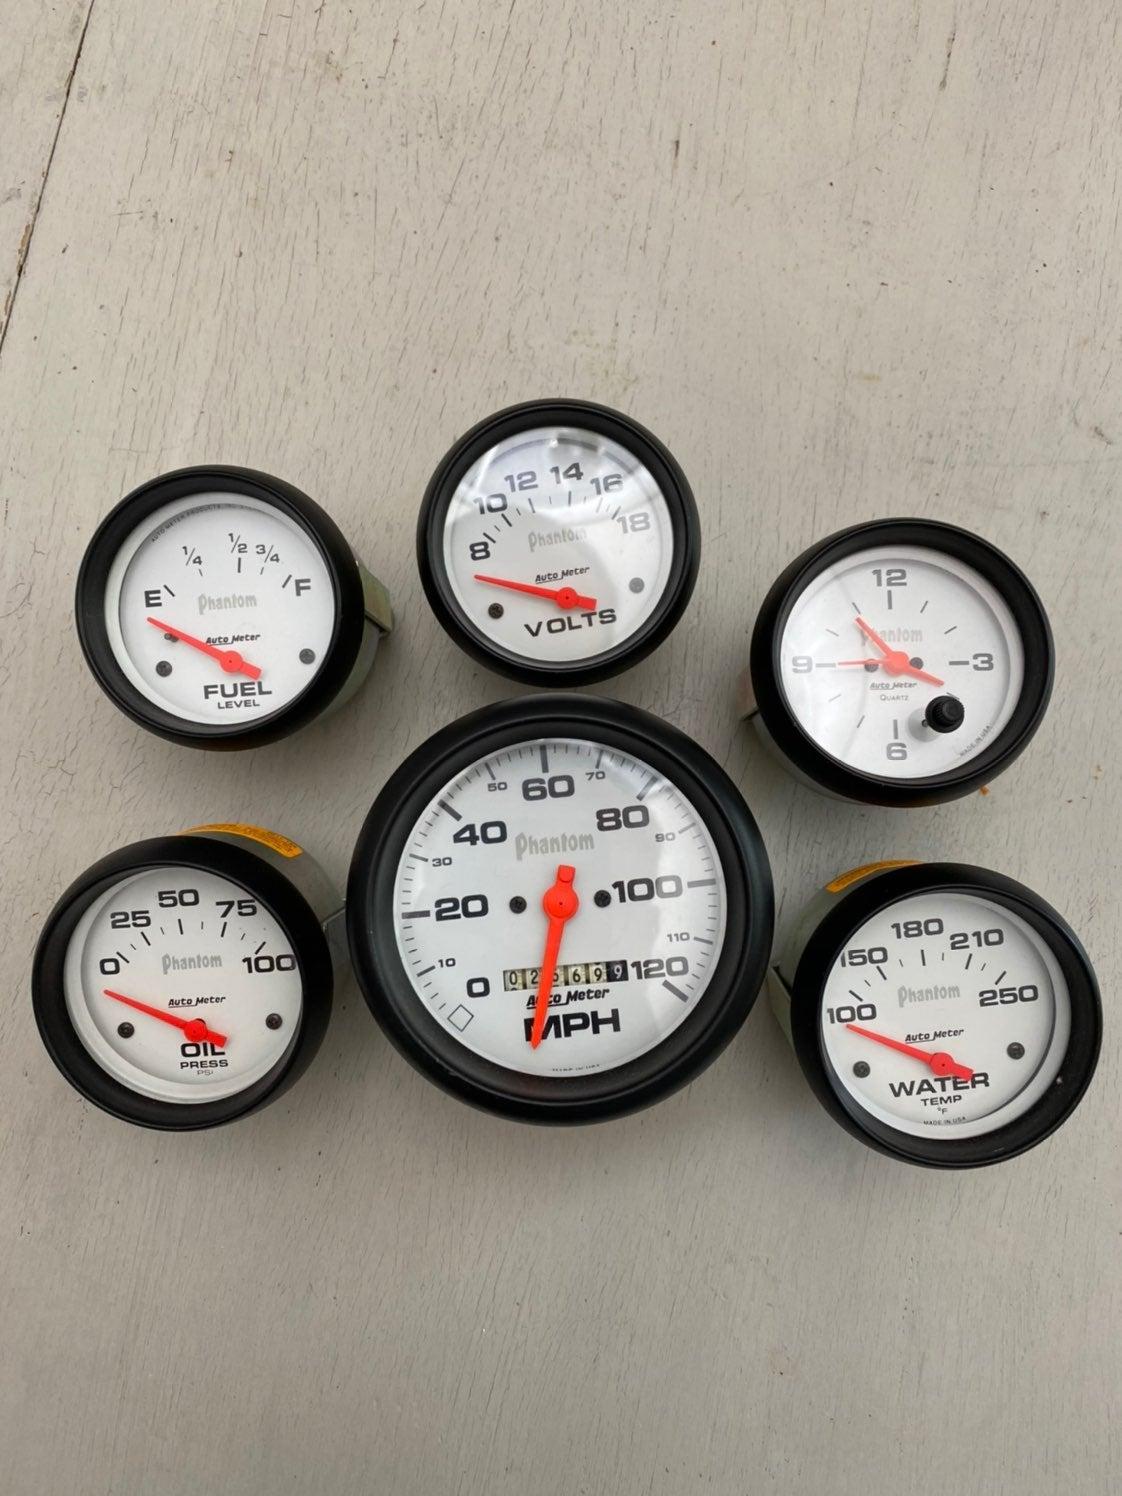 AutoMeter Phantom gauges